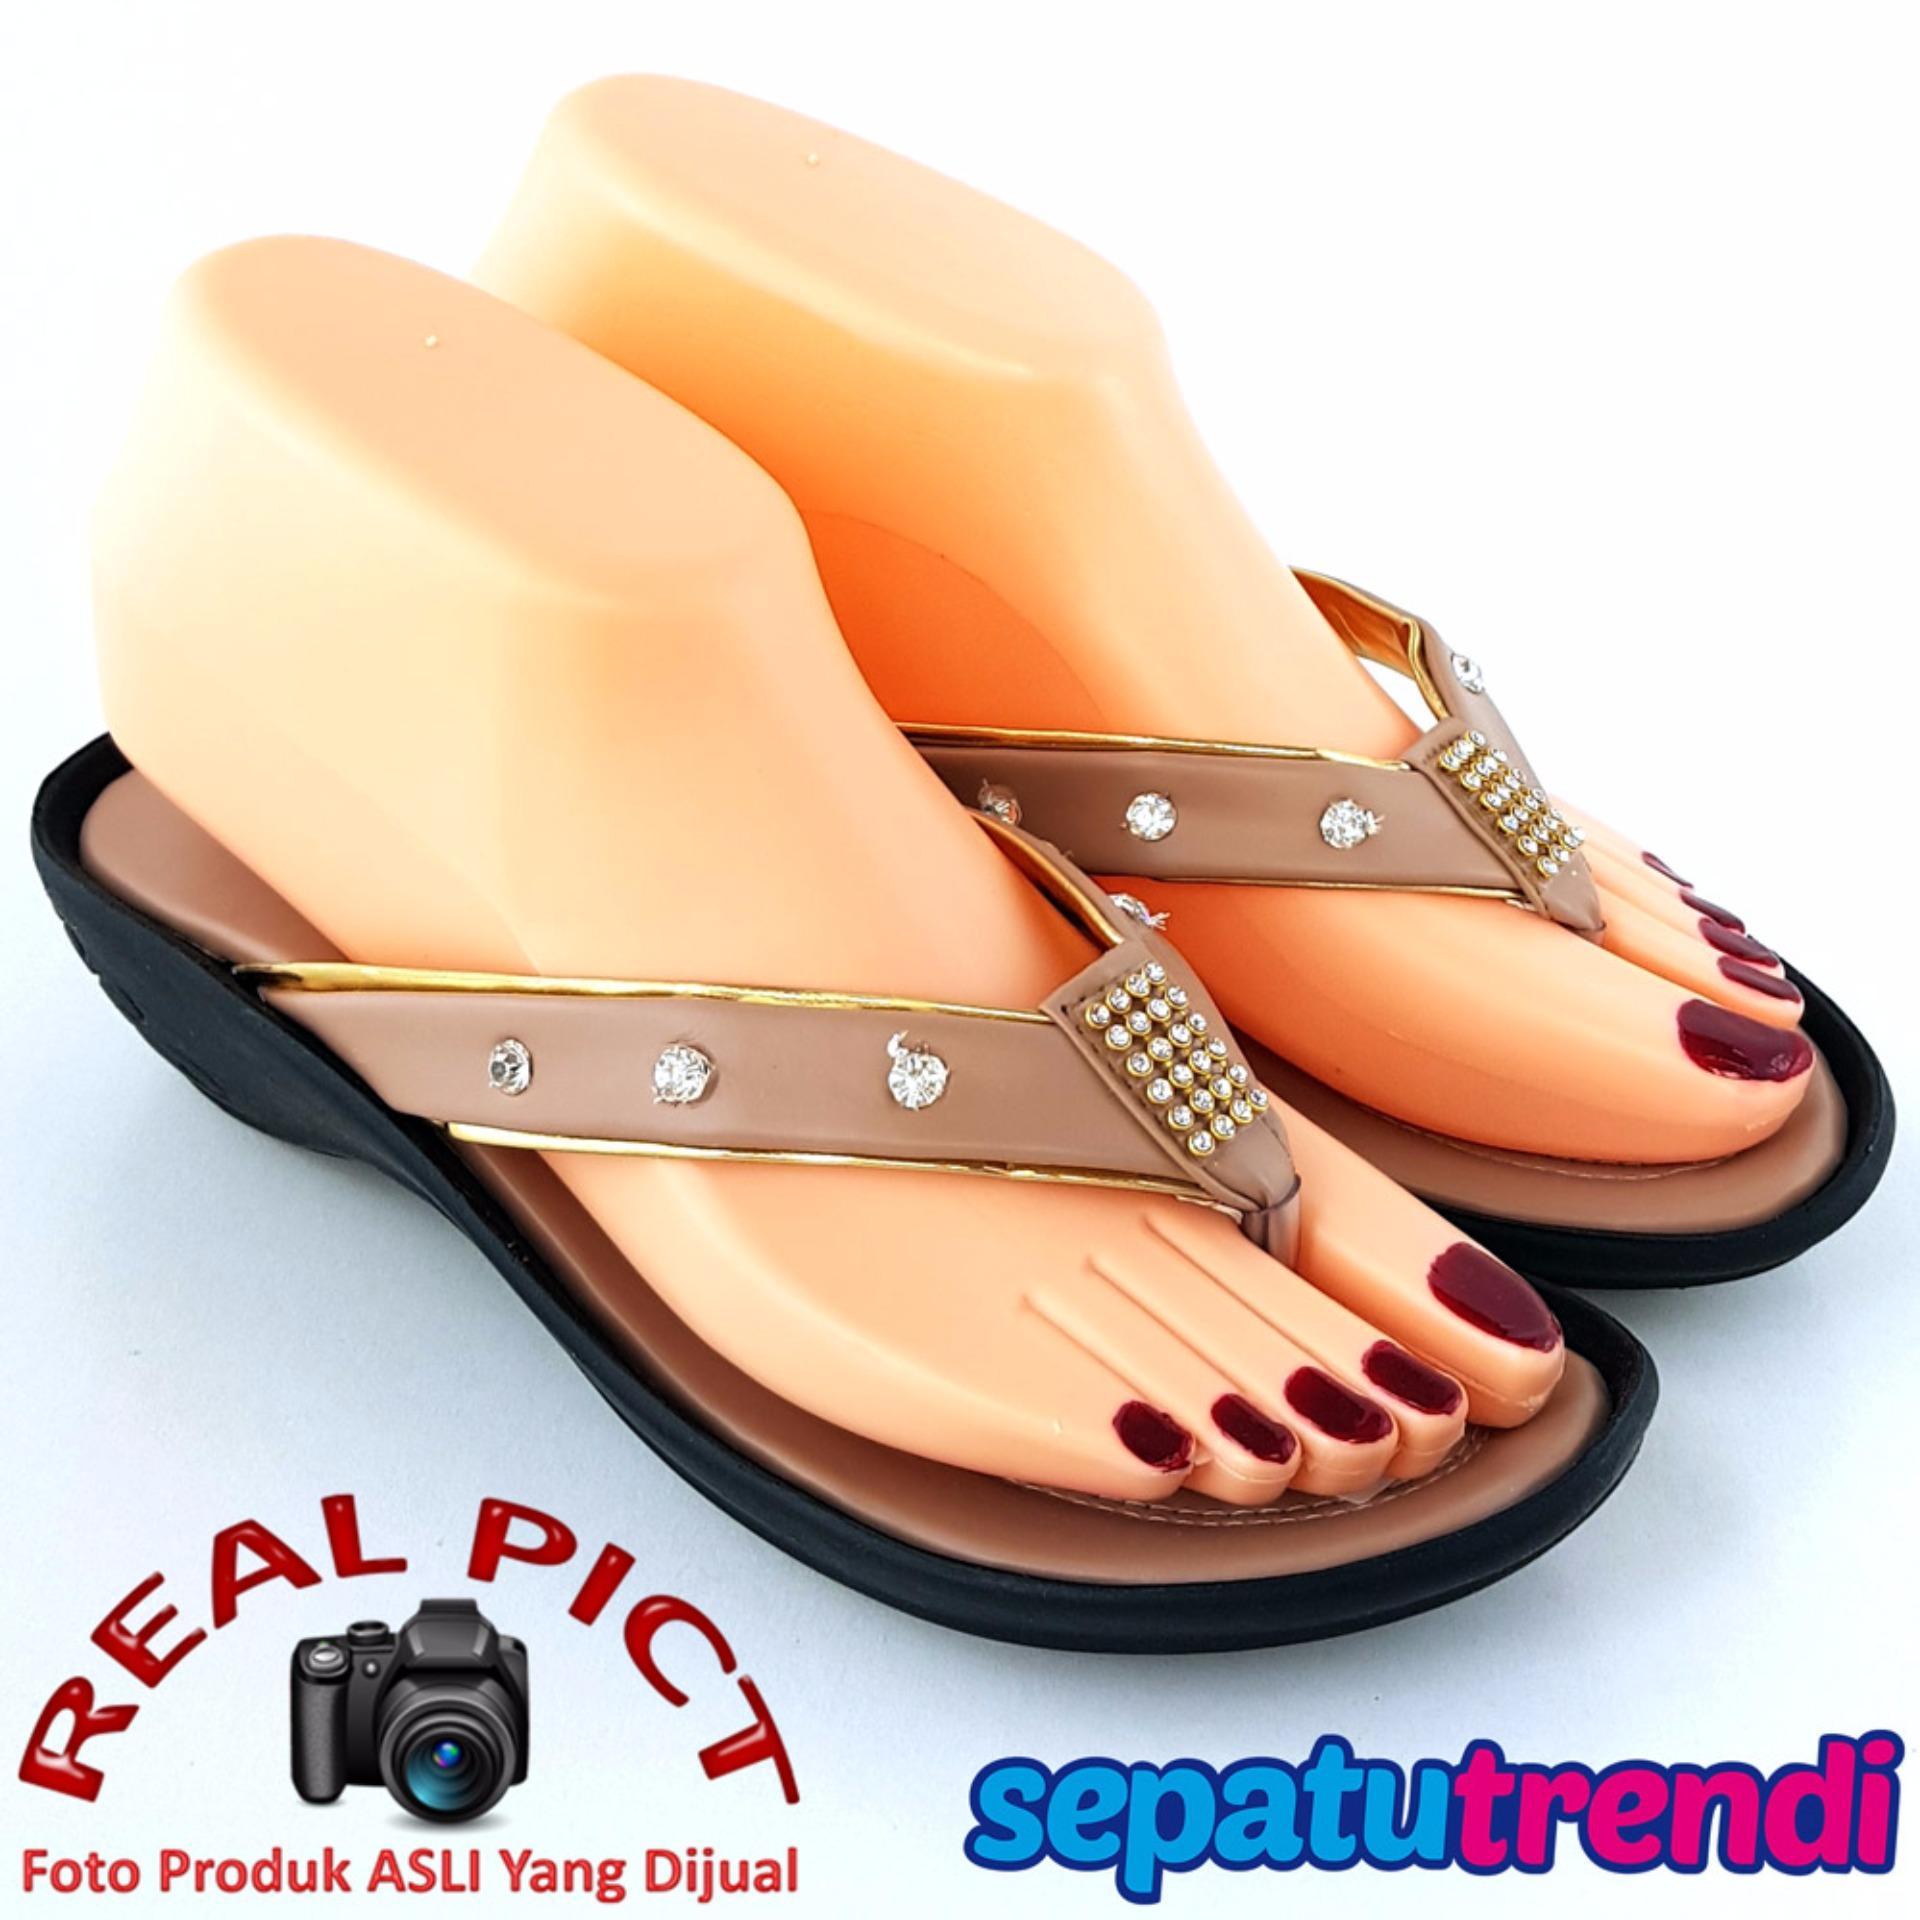 TrendiShoes Sandal Wanita Wedges Jepit Cantik BOCS01 - Mocca